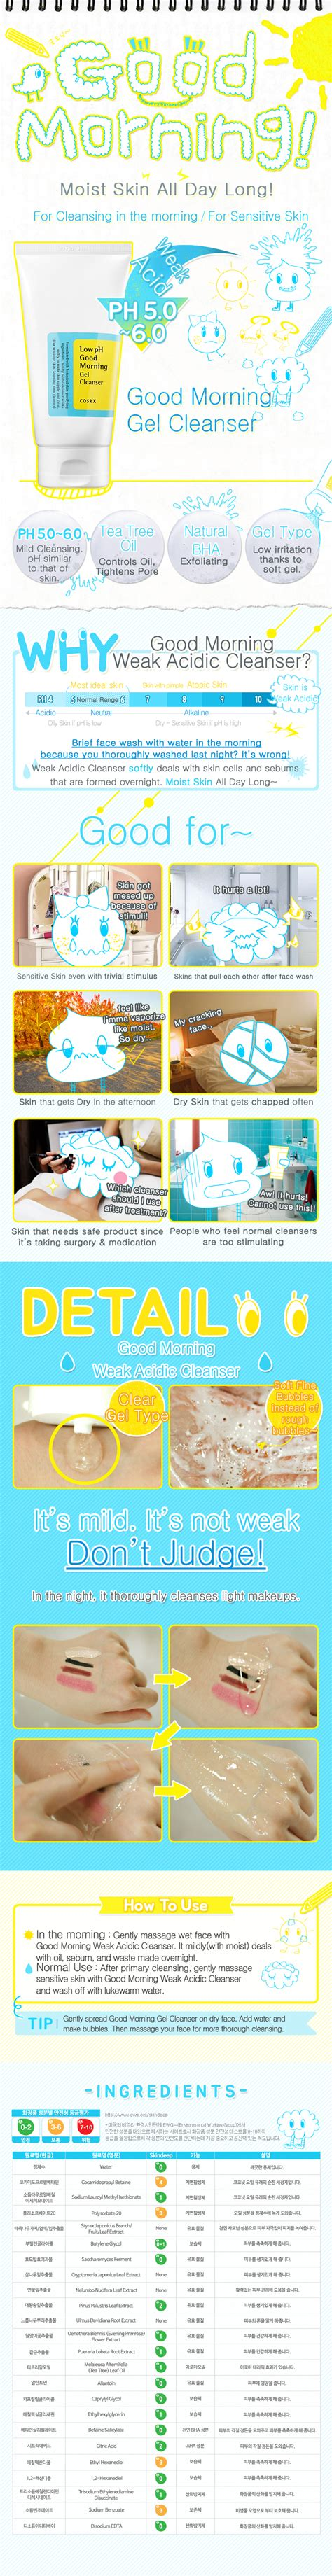 Etude One Morning Cleanser 2 Items Sachet cosrx low ph morning gel cleanser 150ml